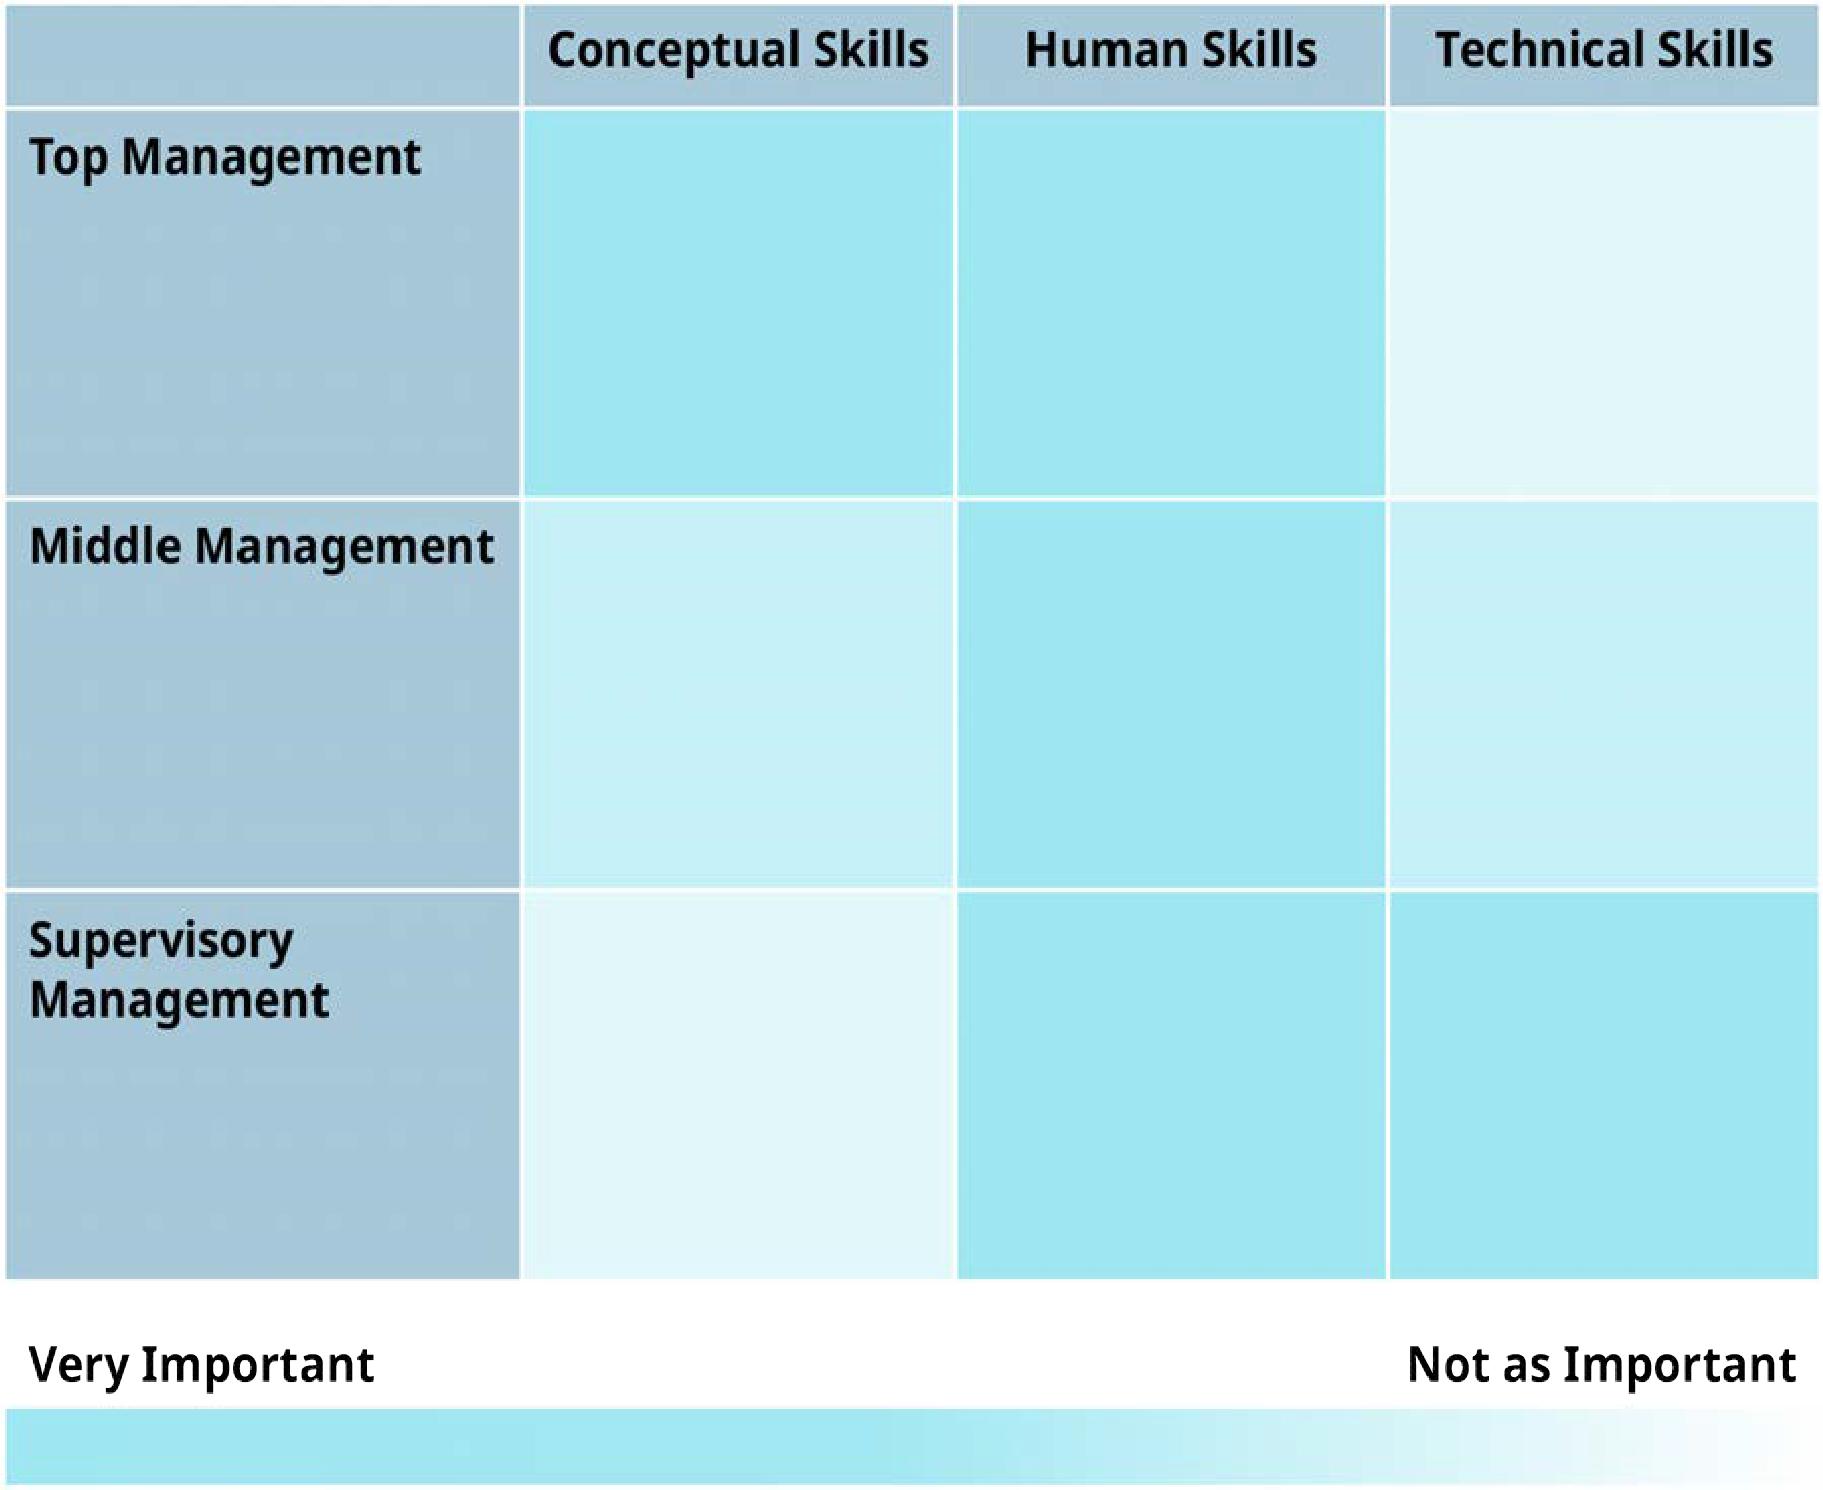 Anexa 6.8 Importanța abilităților manageriale la diferite niveluri de management (Atribuire: Copyright Rice University, OpenStax, sub licența CC BY 4.0.)